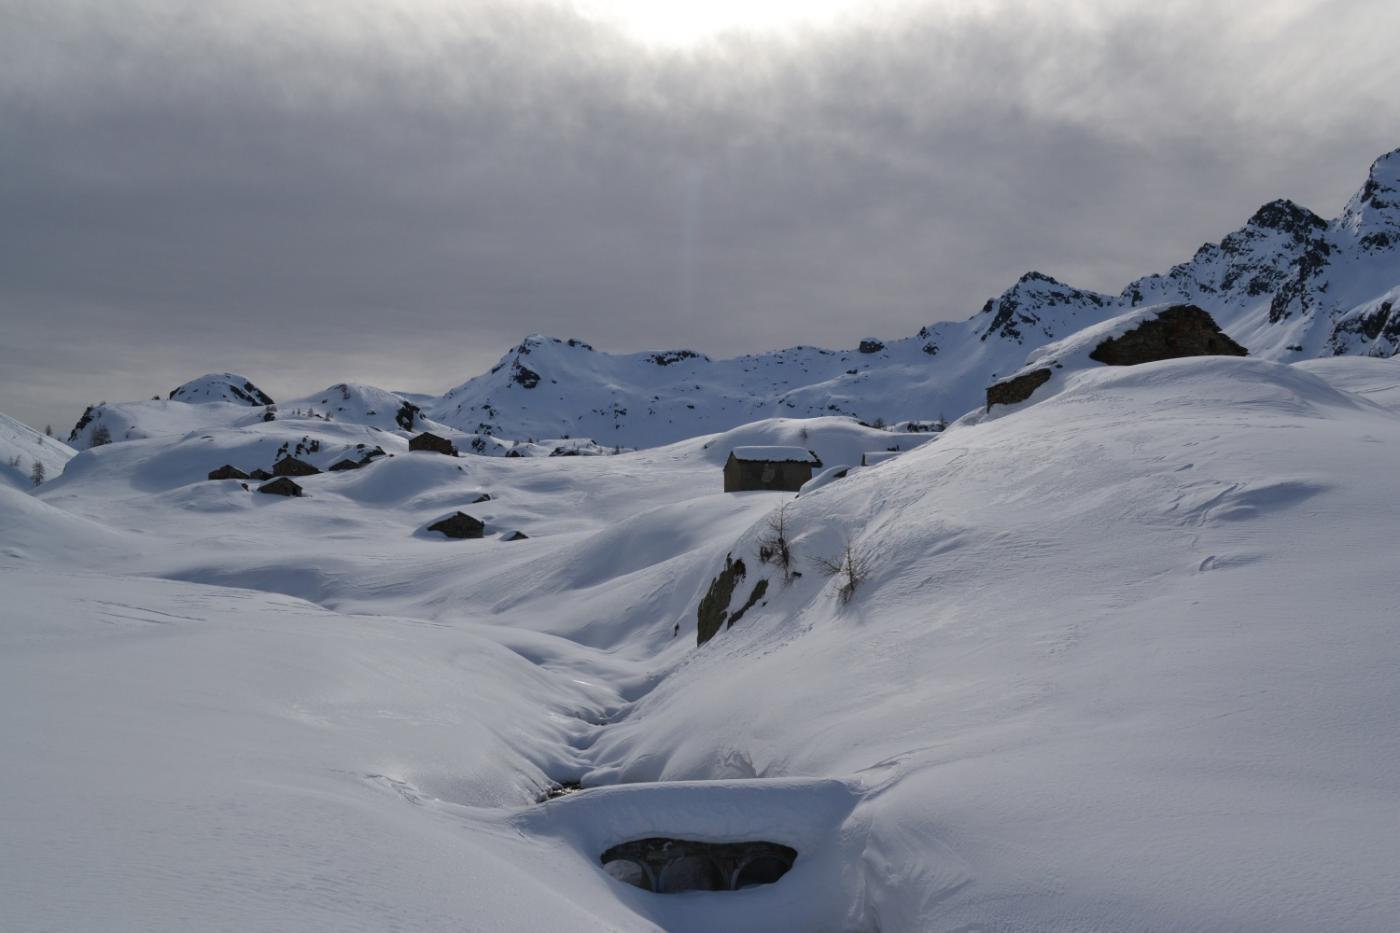 arrivo all'Alpe Loo di sopra